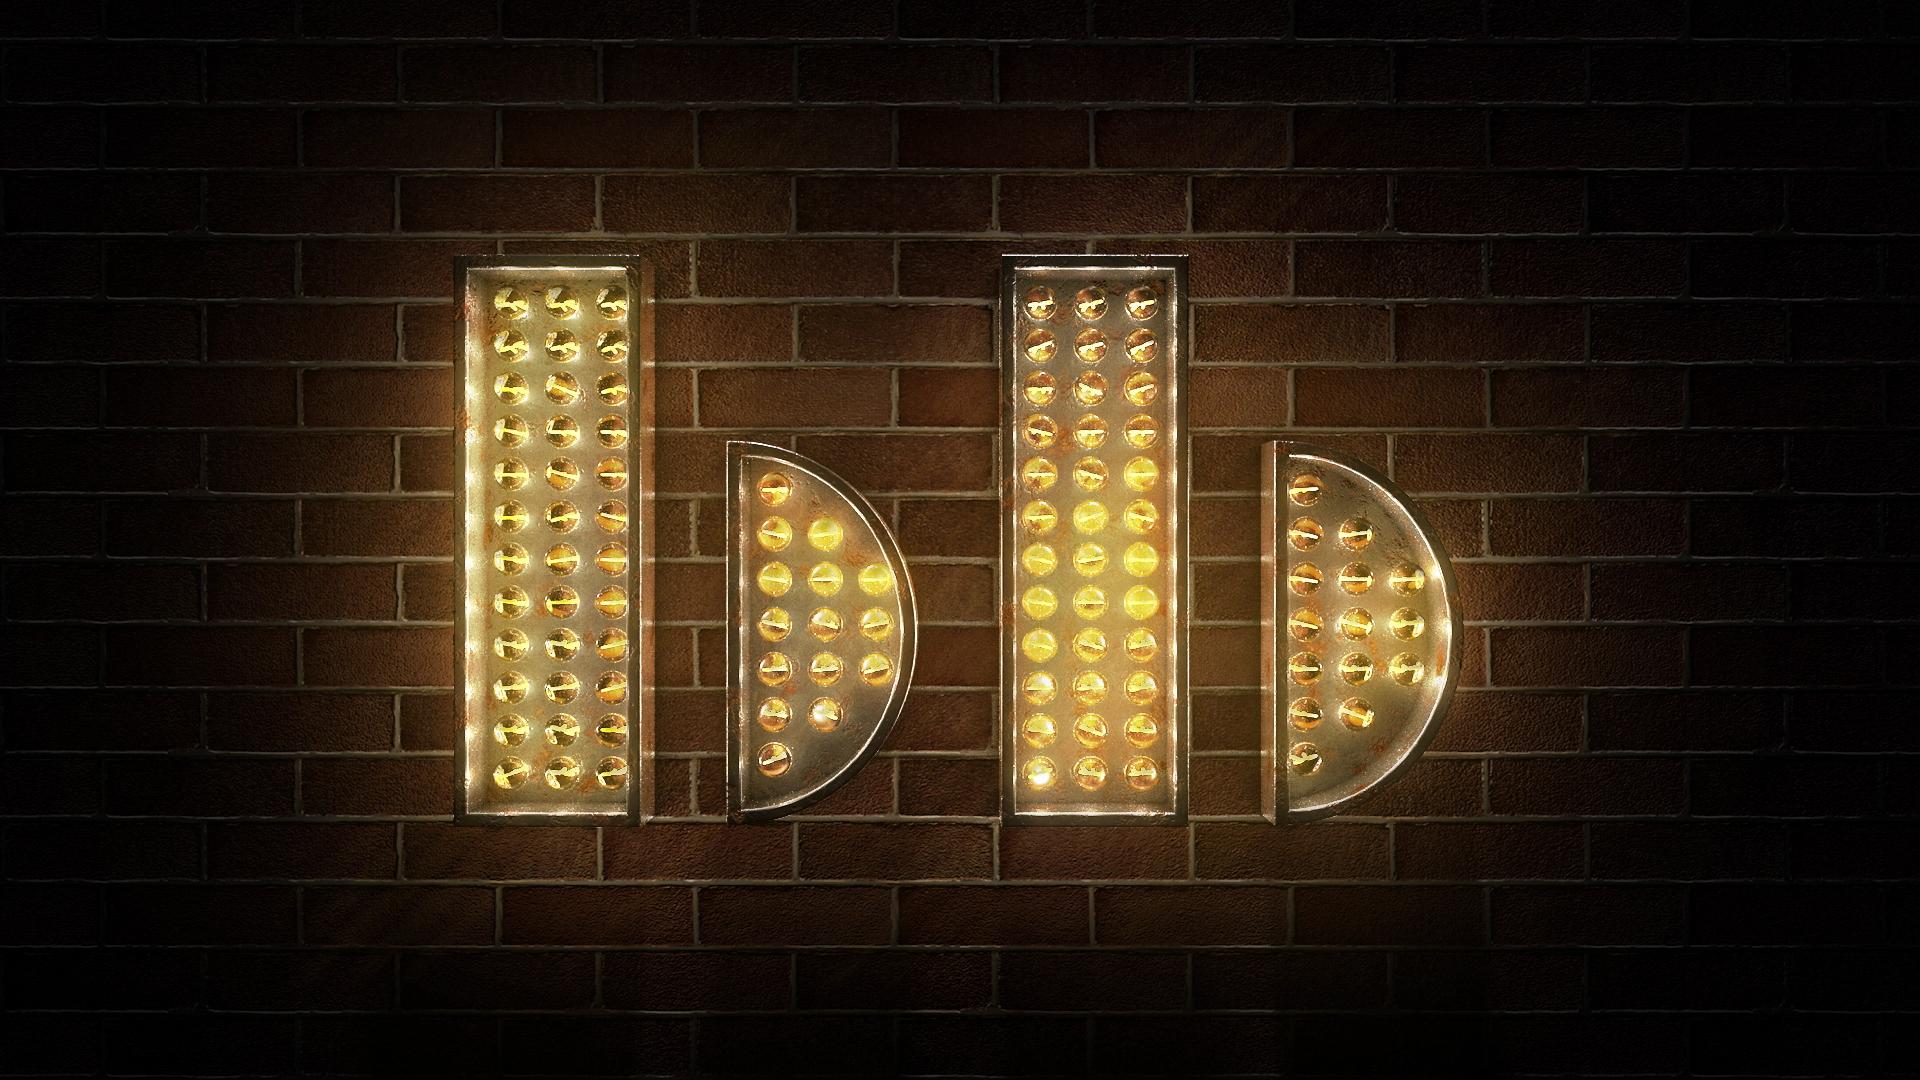 Bom Bom logo marquee made of halogen lightbulbs